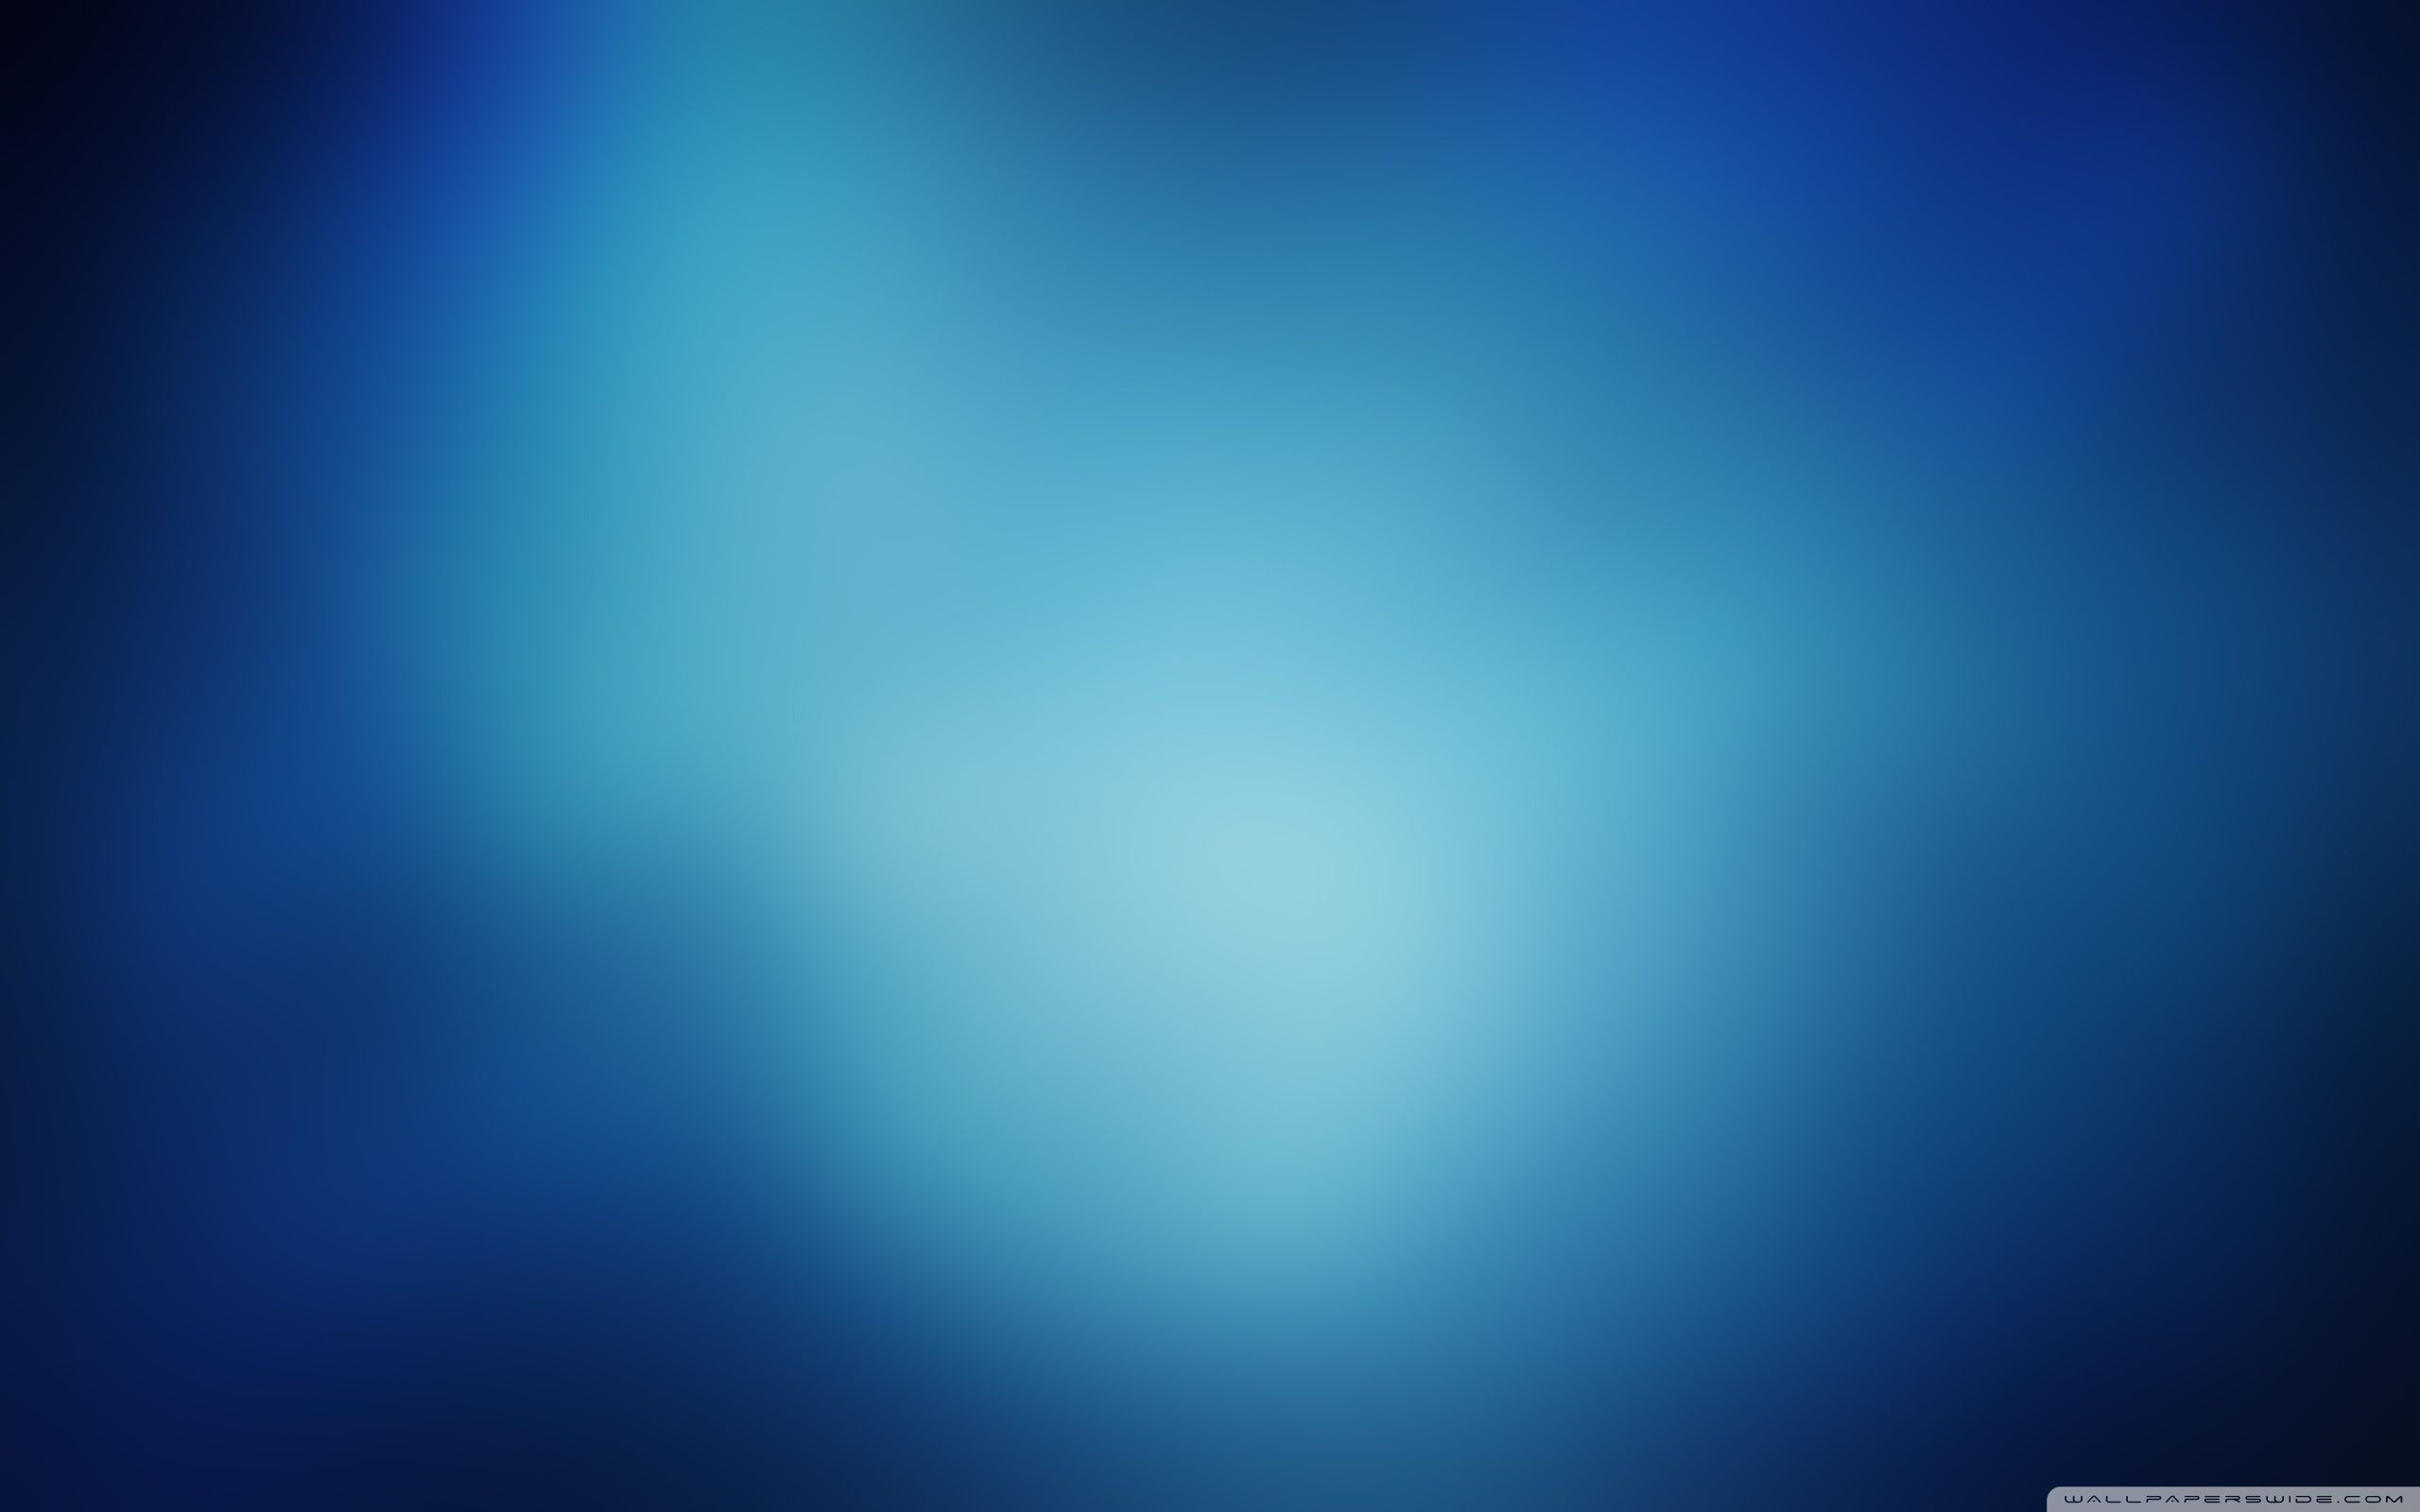 Gradients Wallpaper Hd Resolution Dark Wallpaper Free Wallpaper Backgrounds Blue Wallpapers